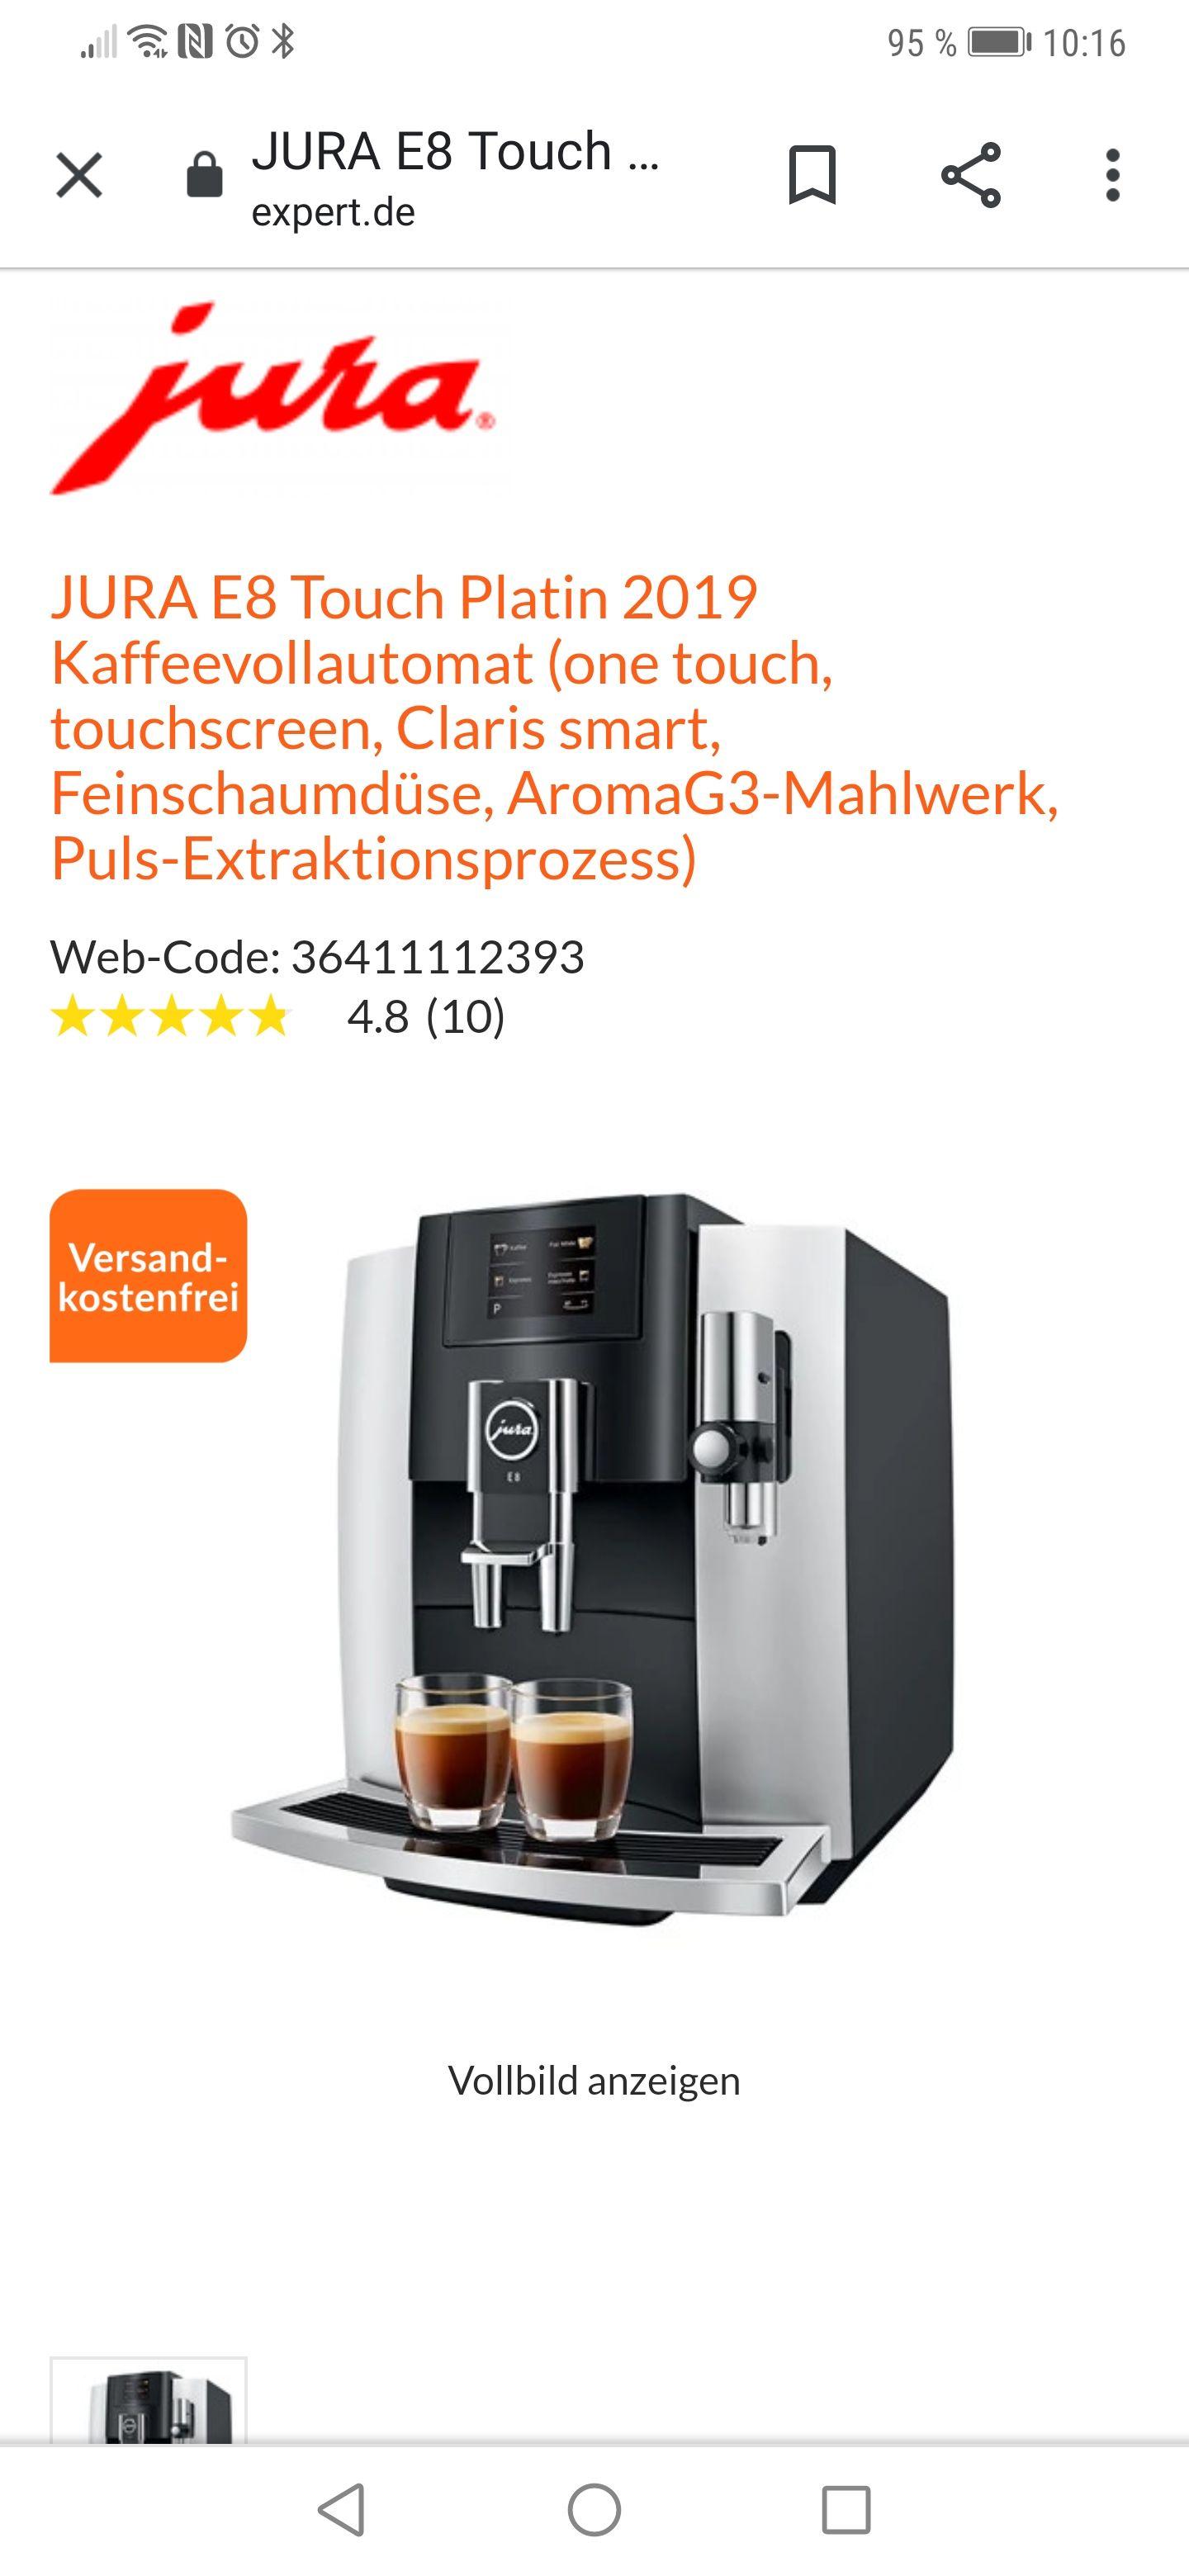 Jura E8 Modell 2019 Kaffeevollautomat